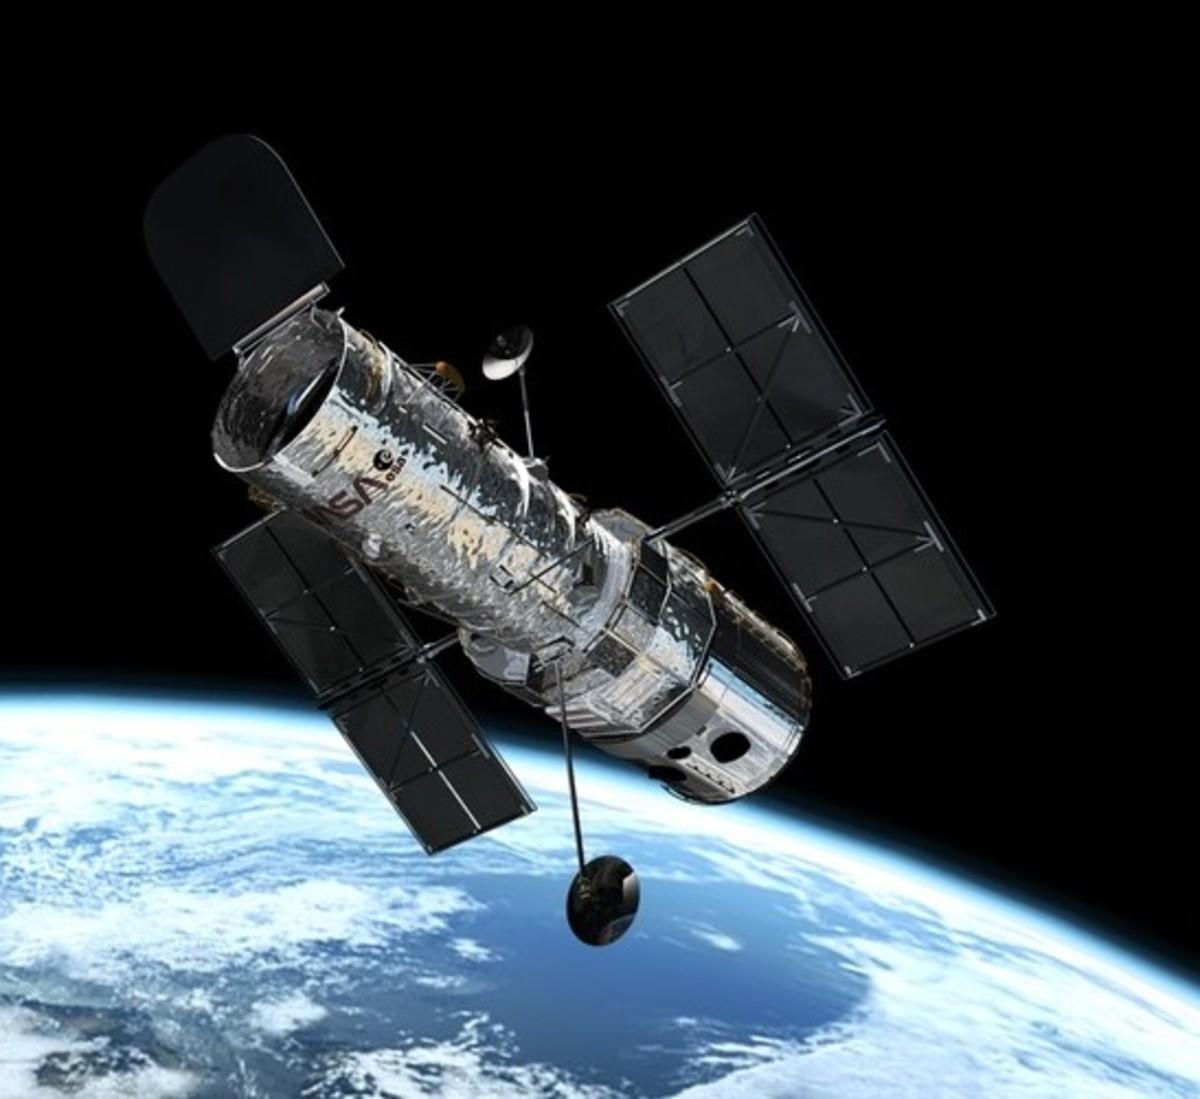 Hubble Telescope in orbit around Earth.